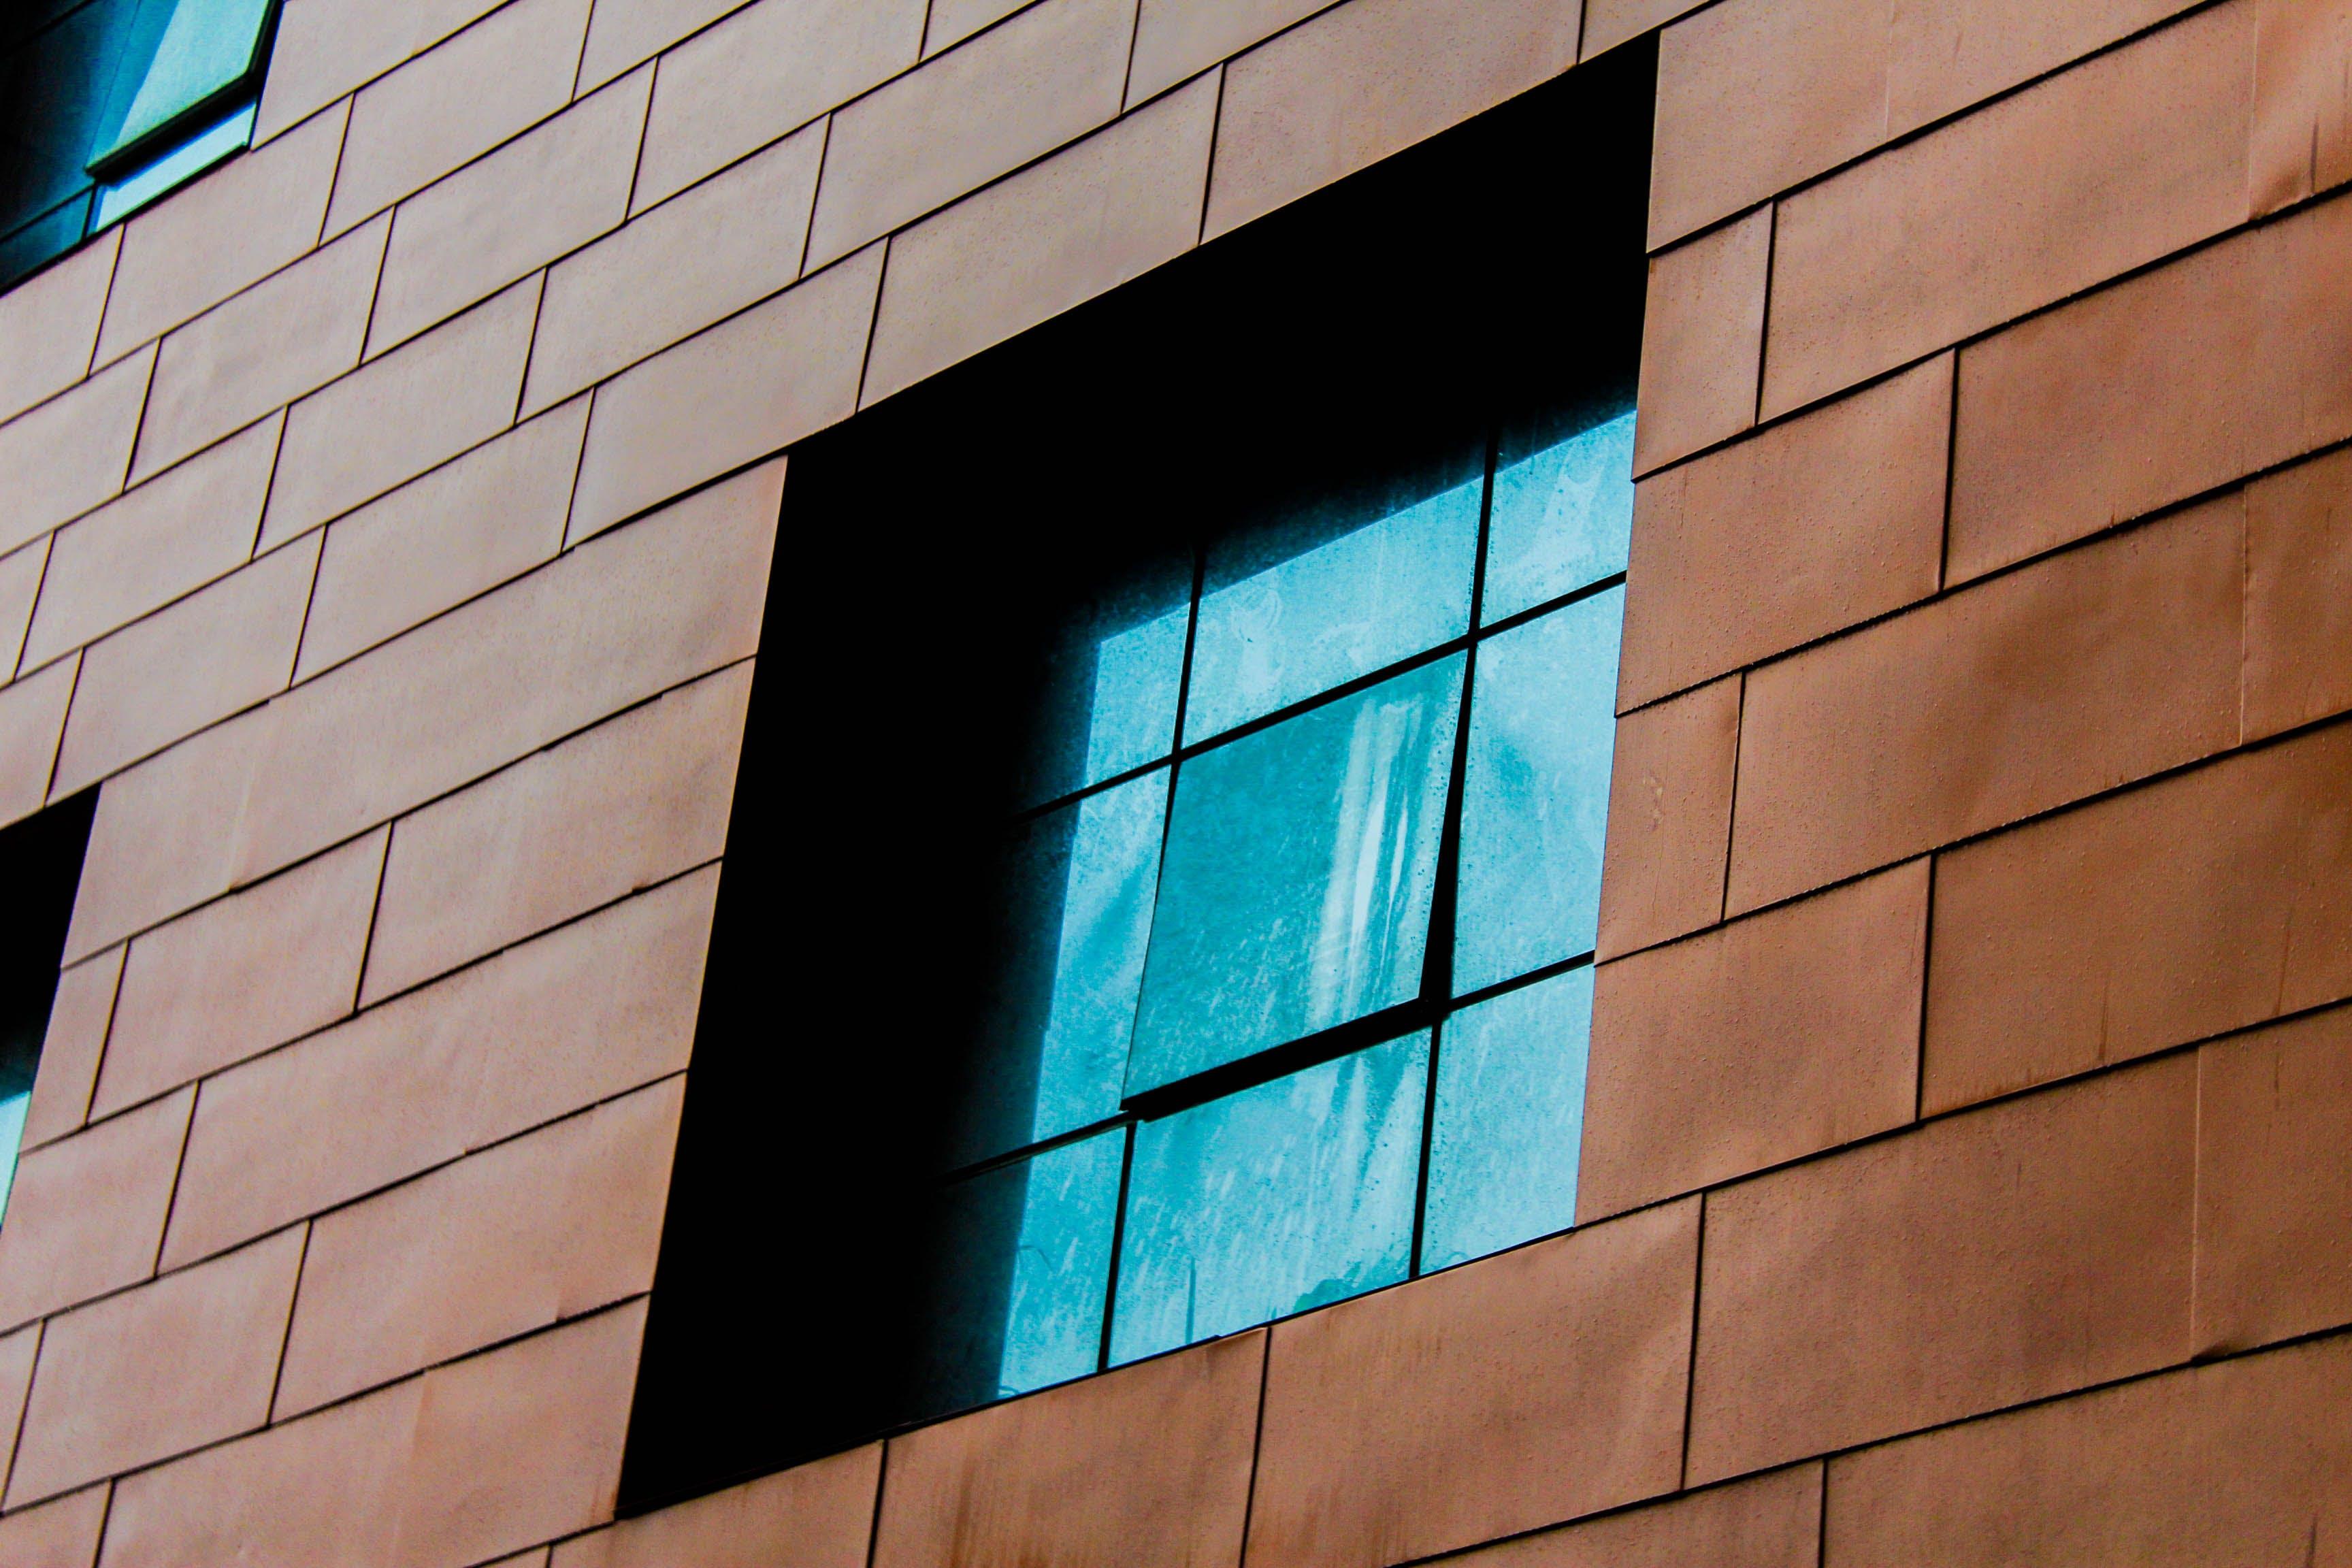 blue window, building, building exterior